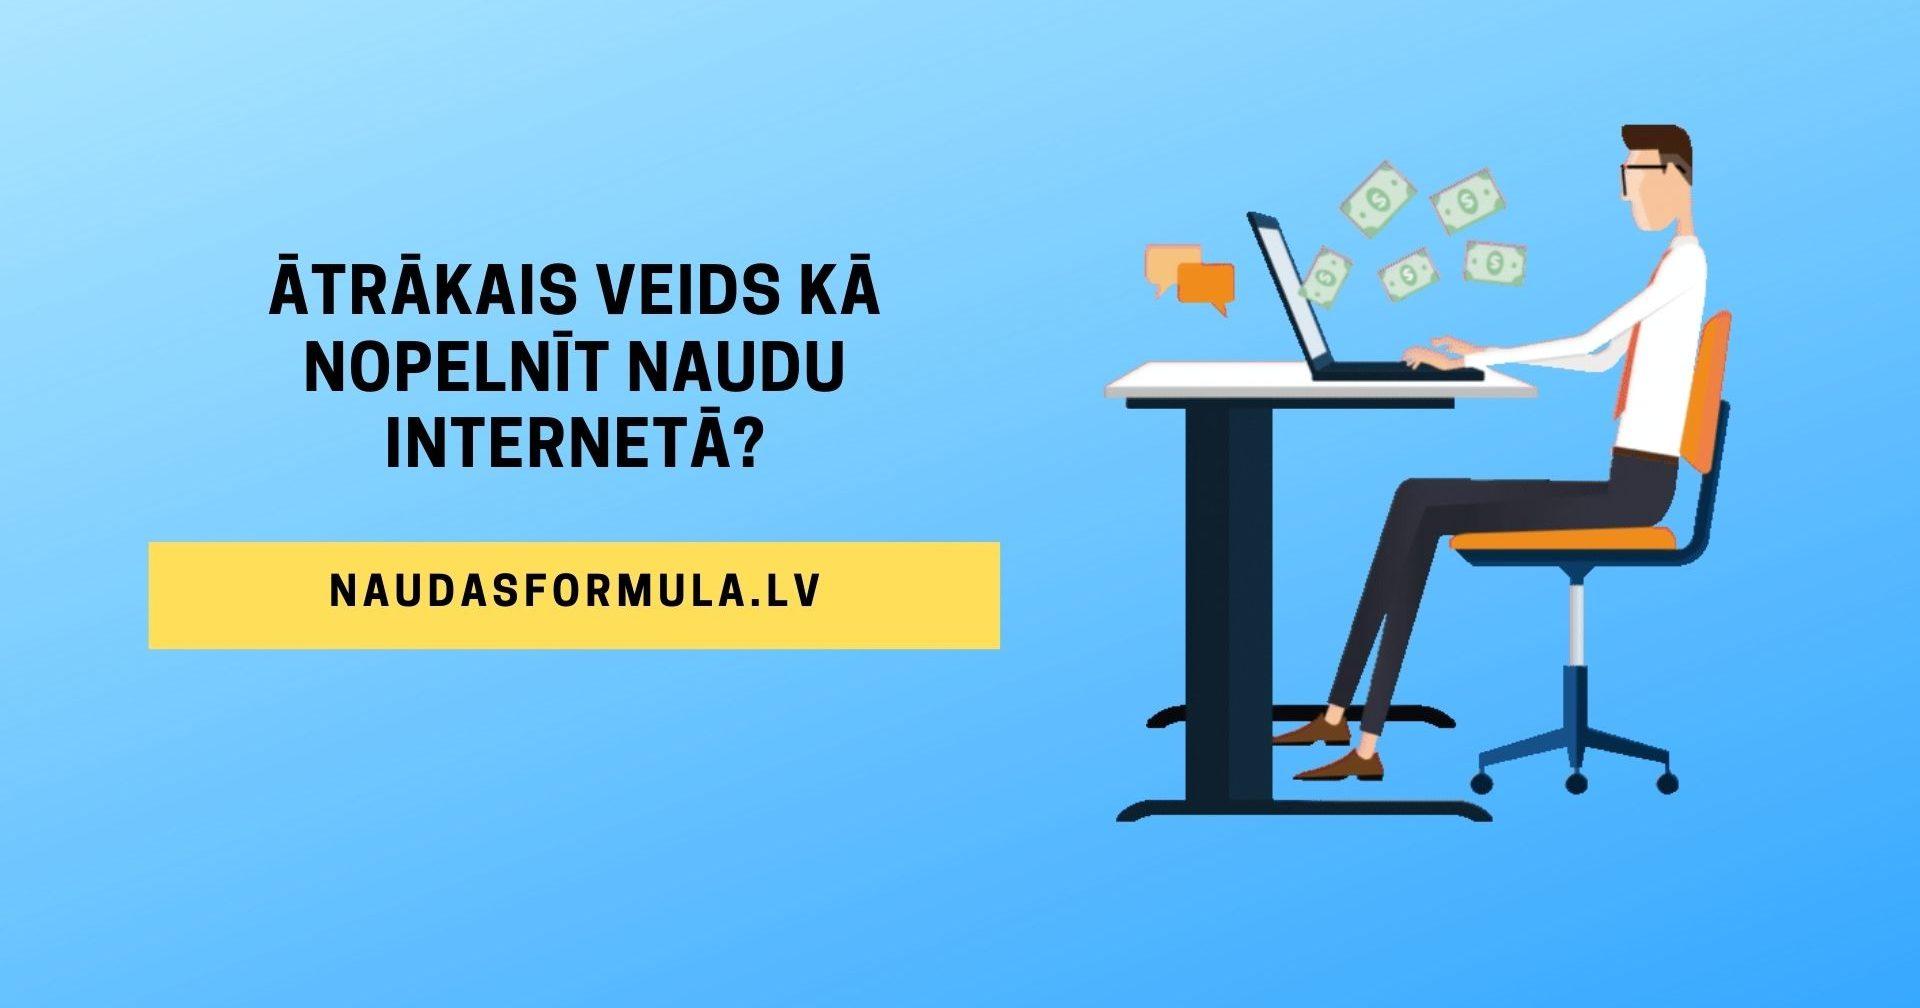 internets nopelna naudu uzreiz